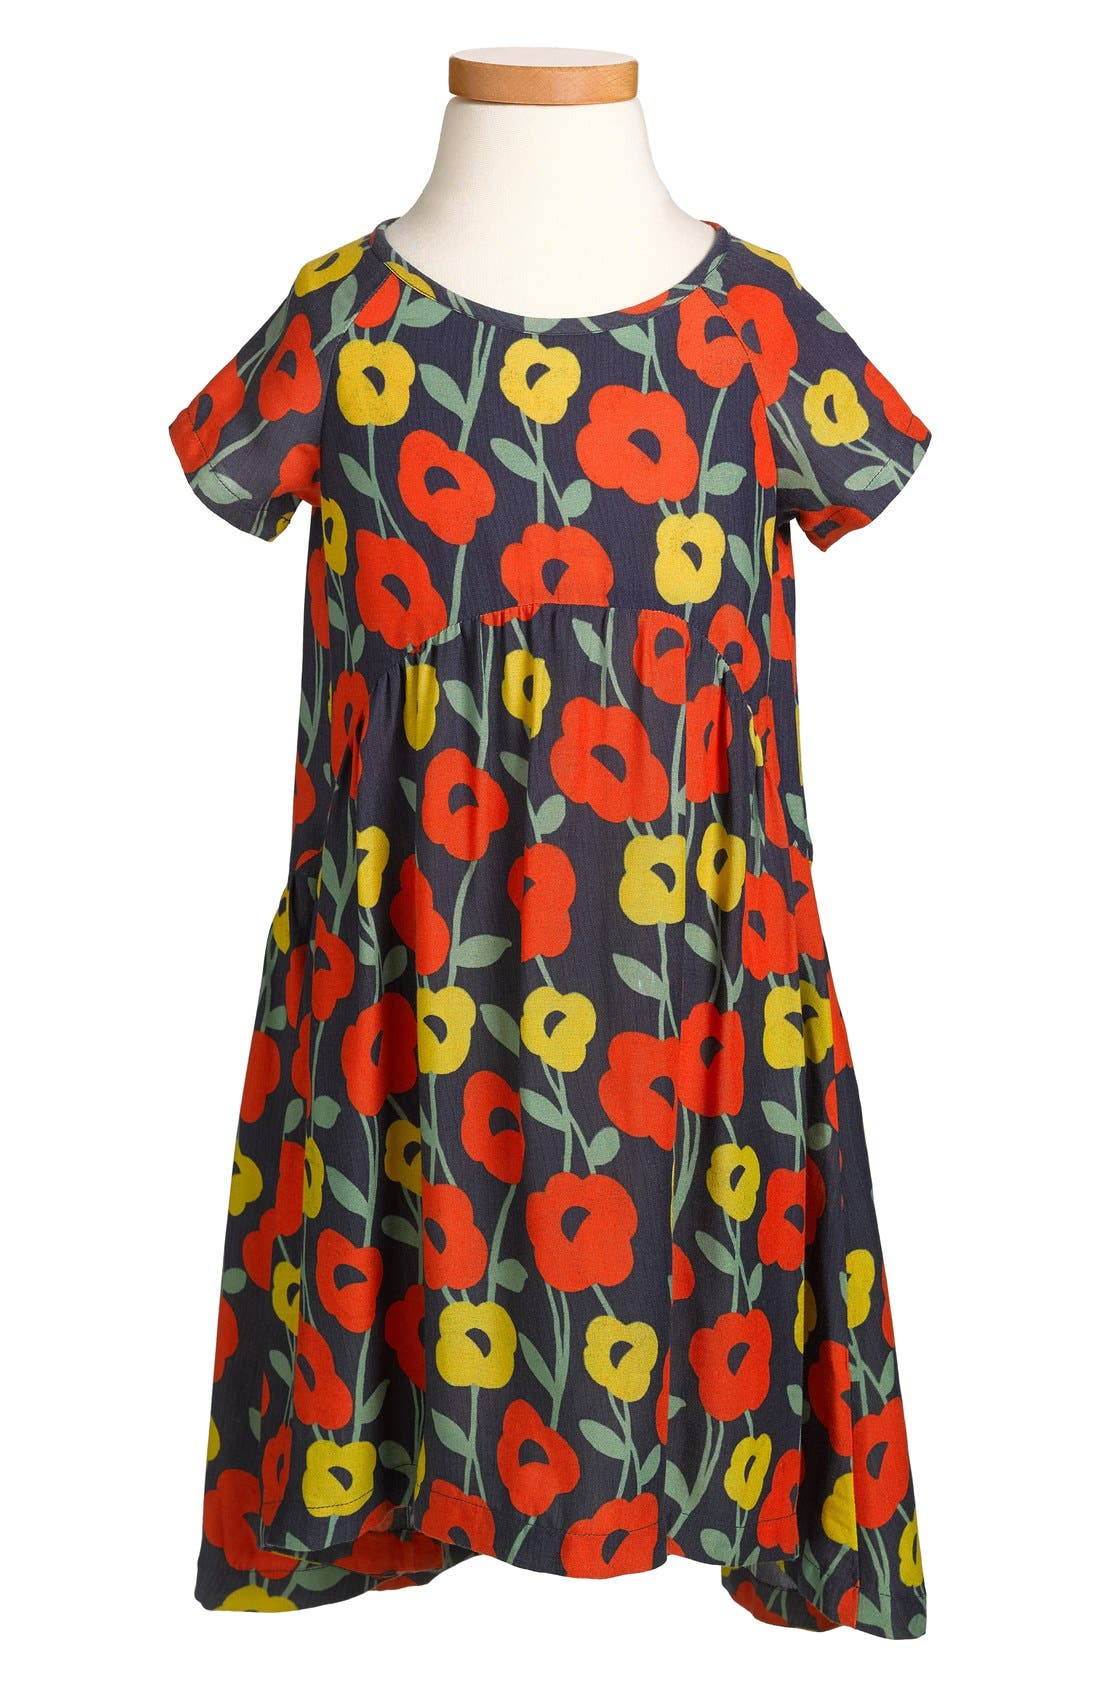 Main Image - Tucker + Tate 'Emmaline' Dress (Toddler Girls, Little Girls & Big Girls)